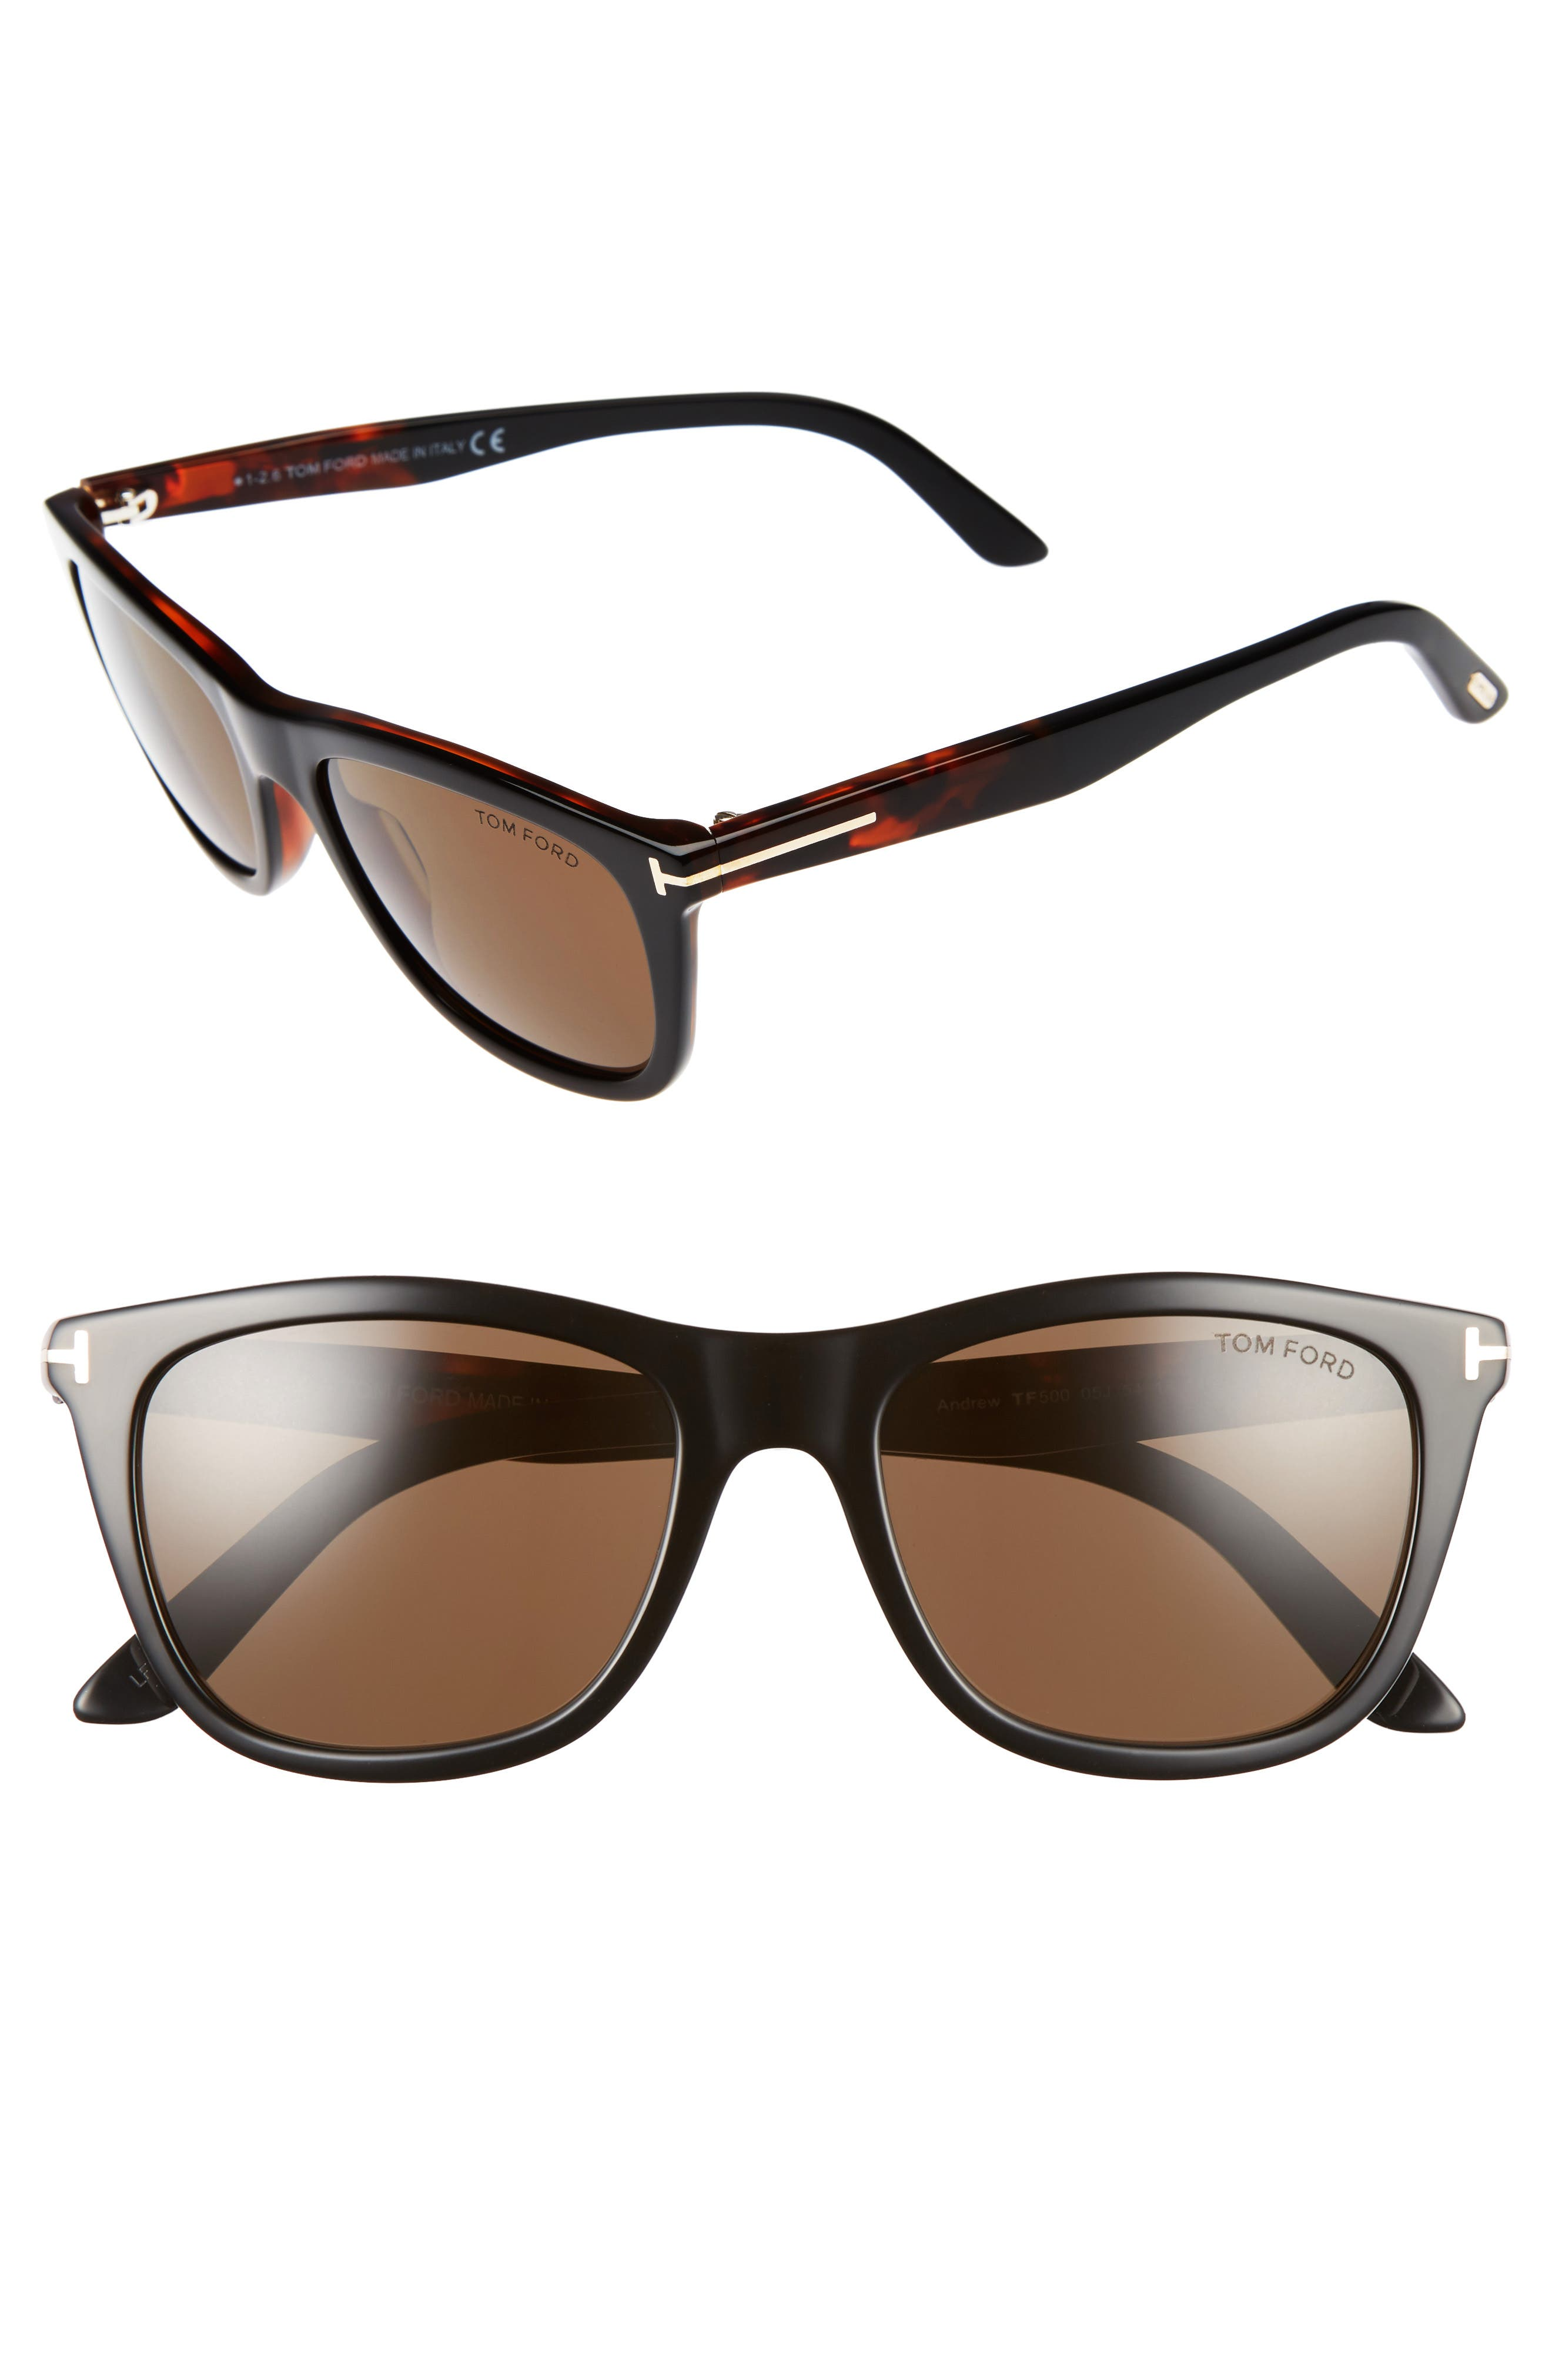 Image of Tom Ford Andrew 54mm Retro Sunglasses